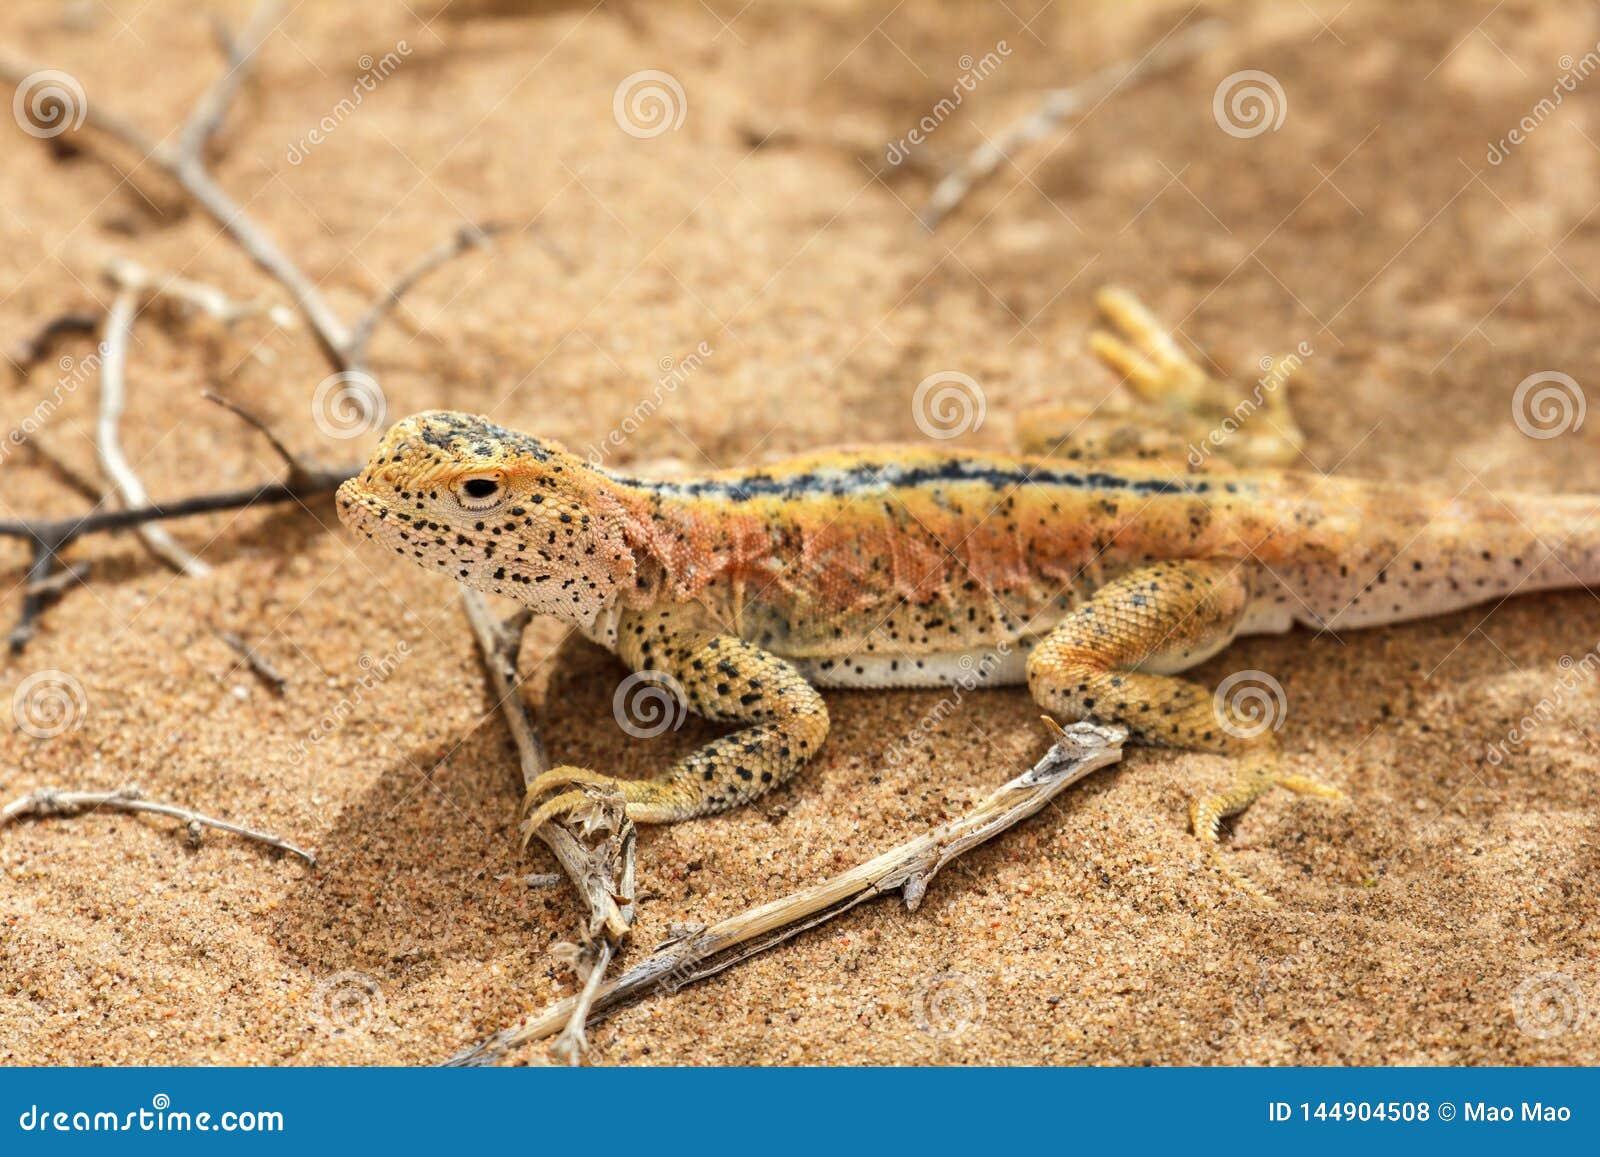 Lagarto na areia no deserto de Gobi, China